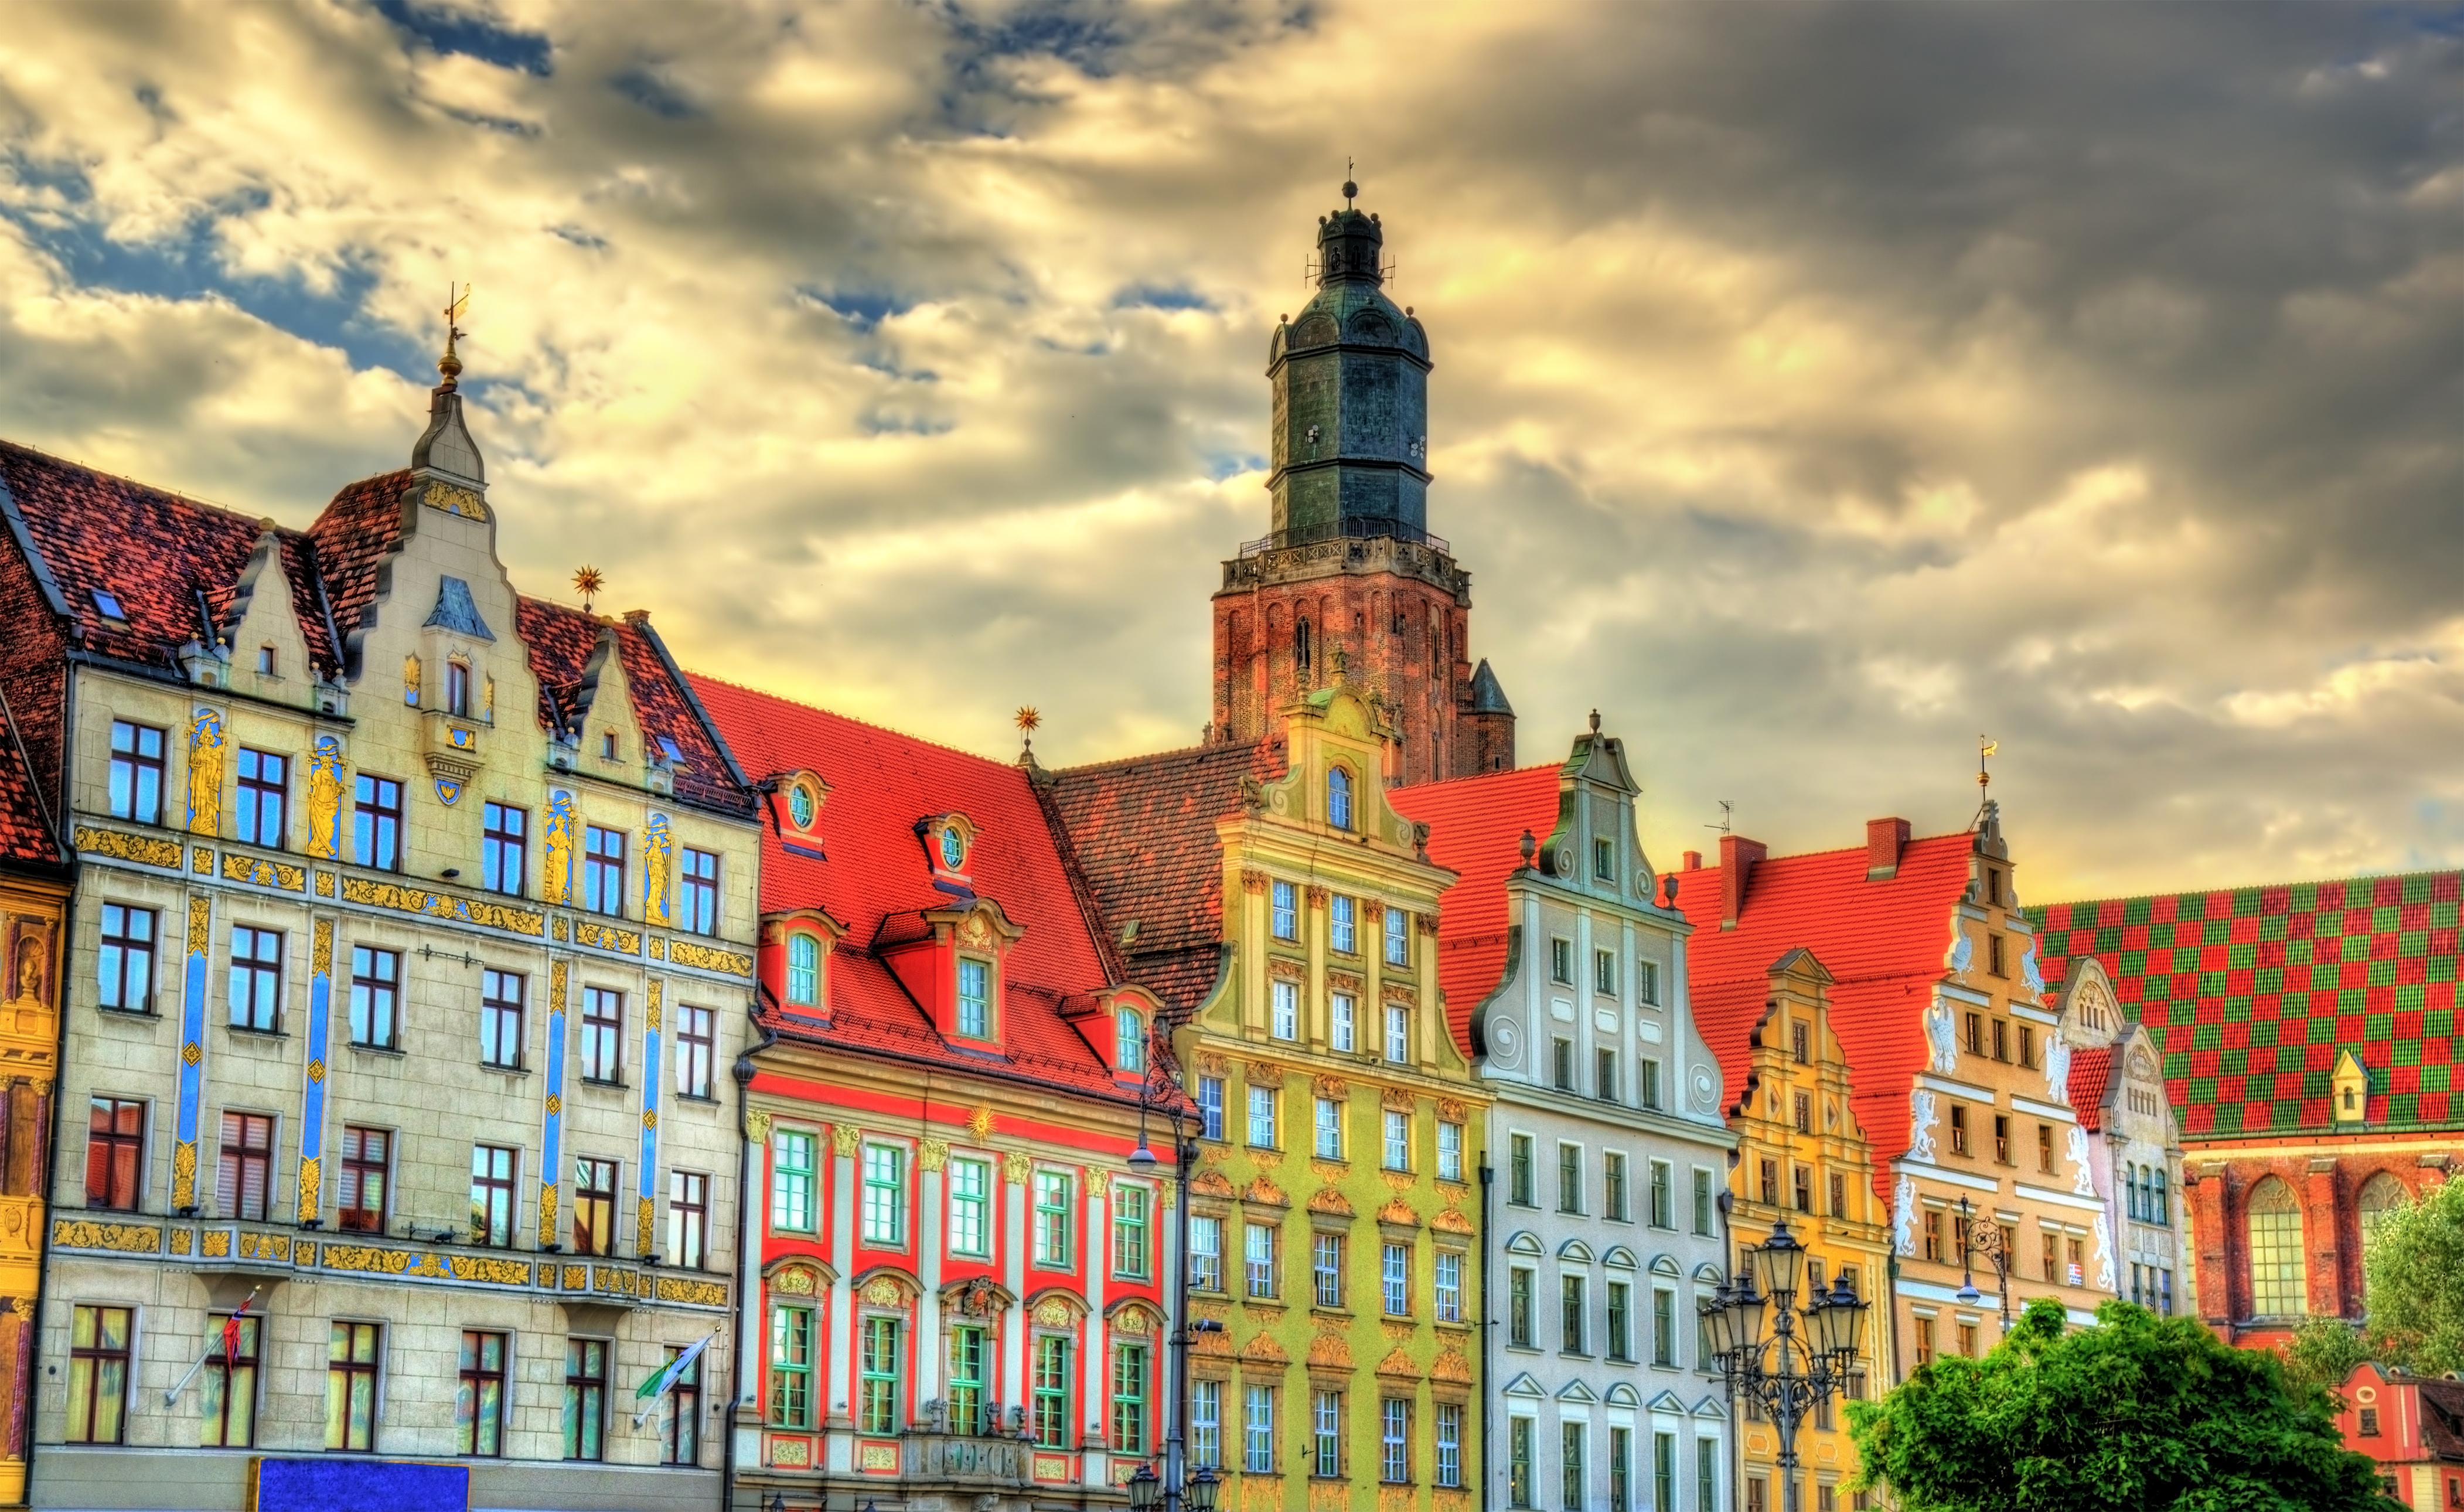 buildings colorful wallpaper - photo #3